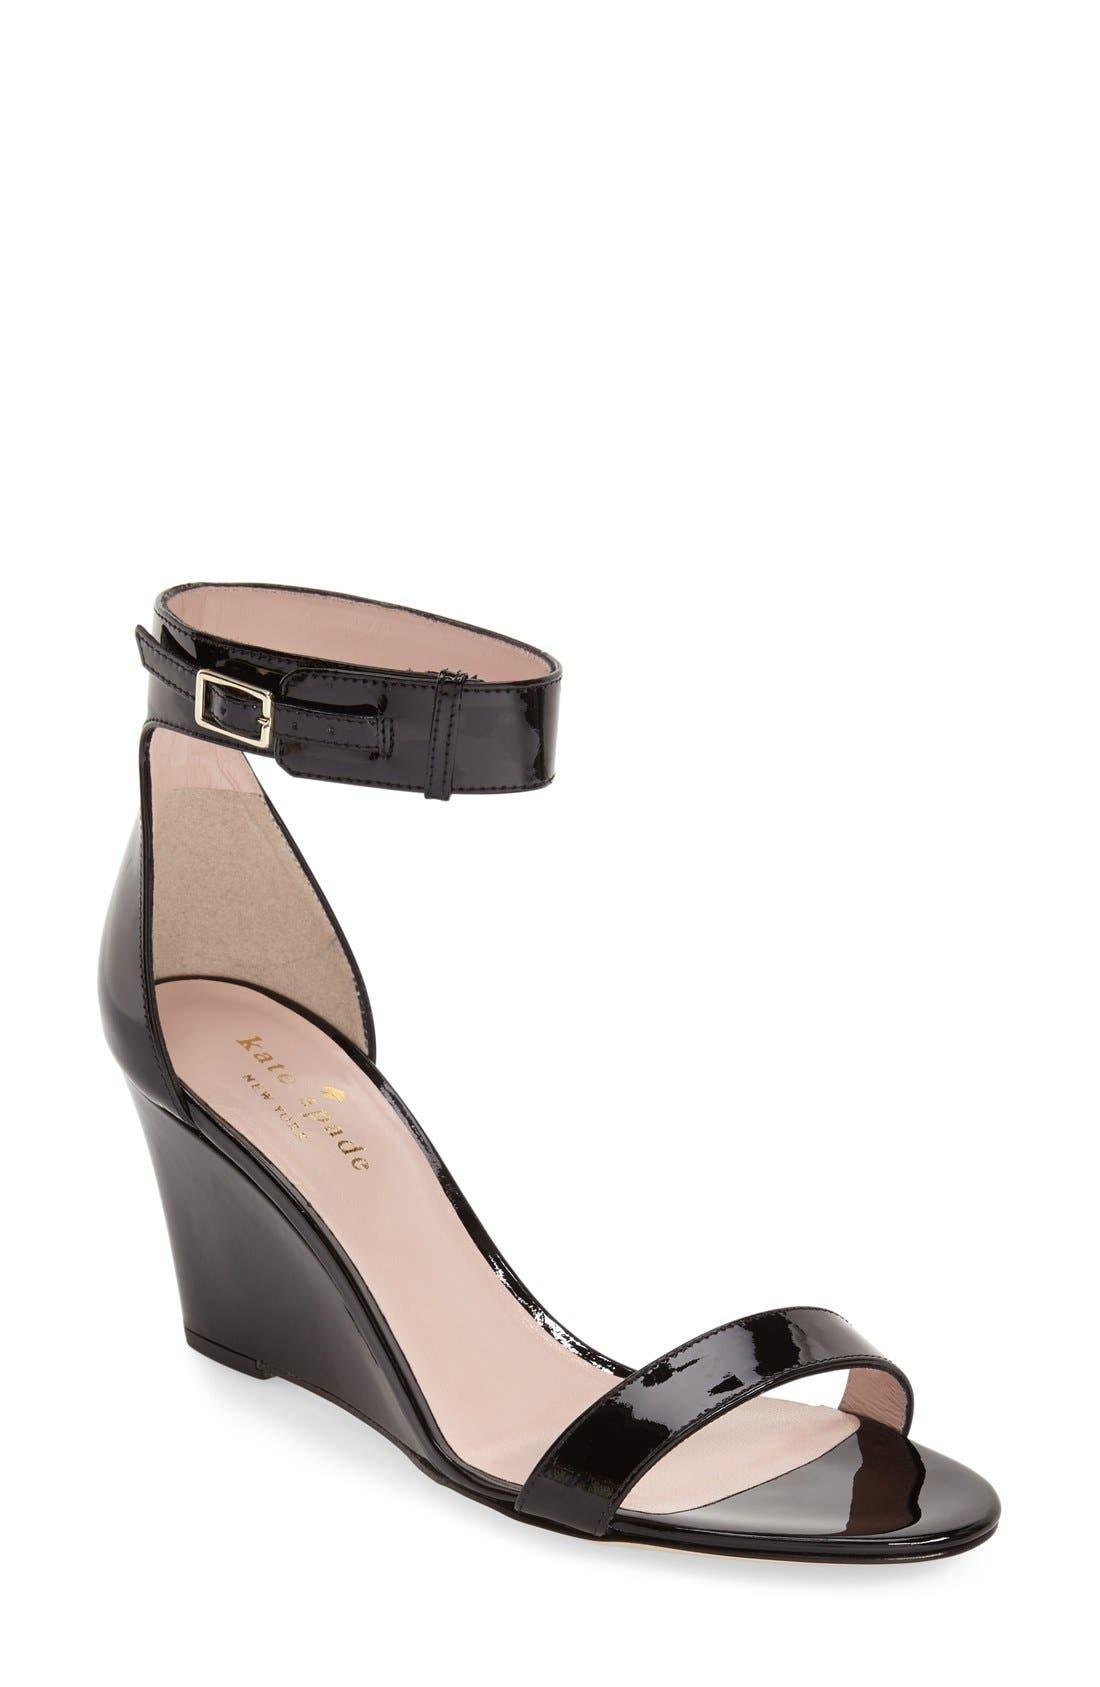 'ronia' wedge sandal,                             Main thumbnail 1, color,                             001